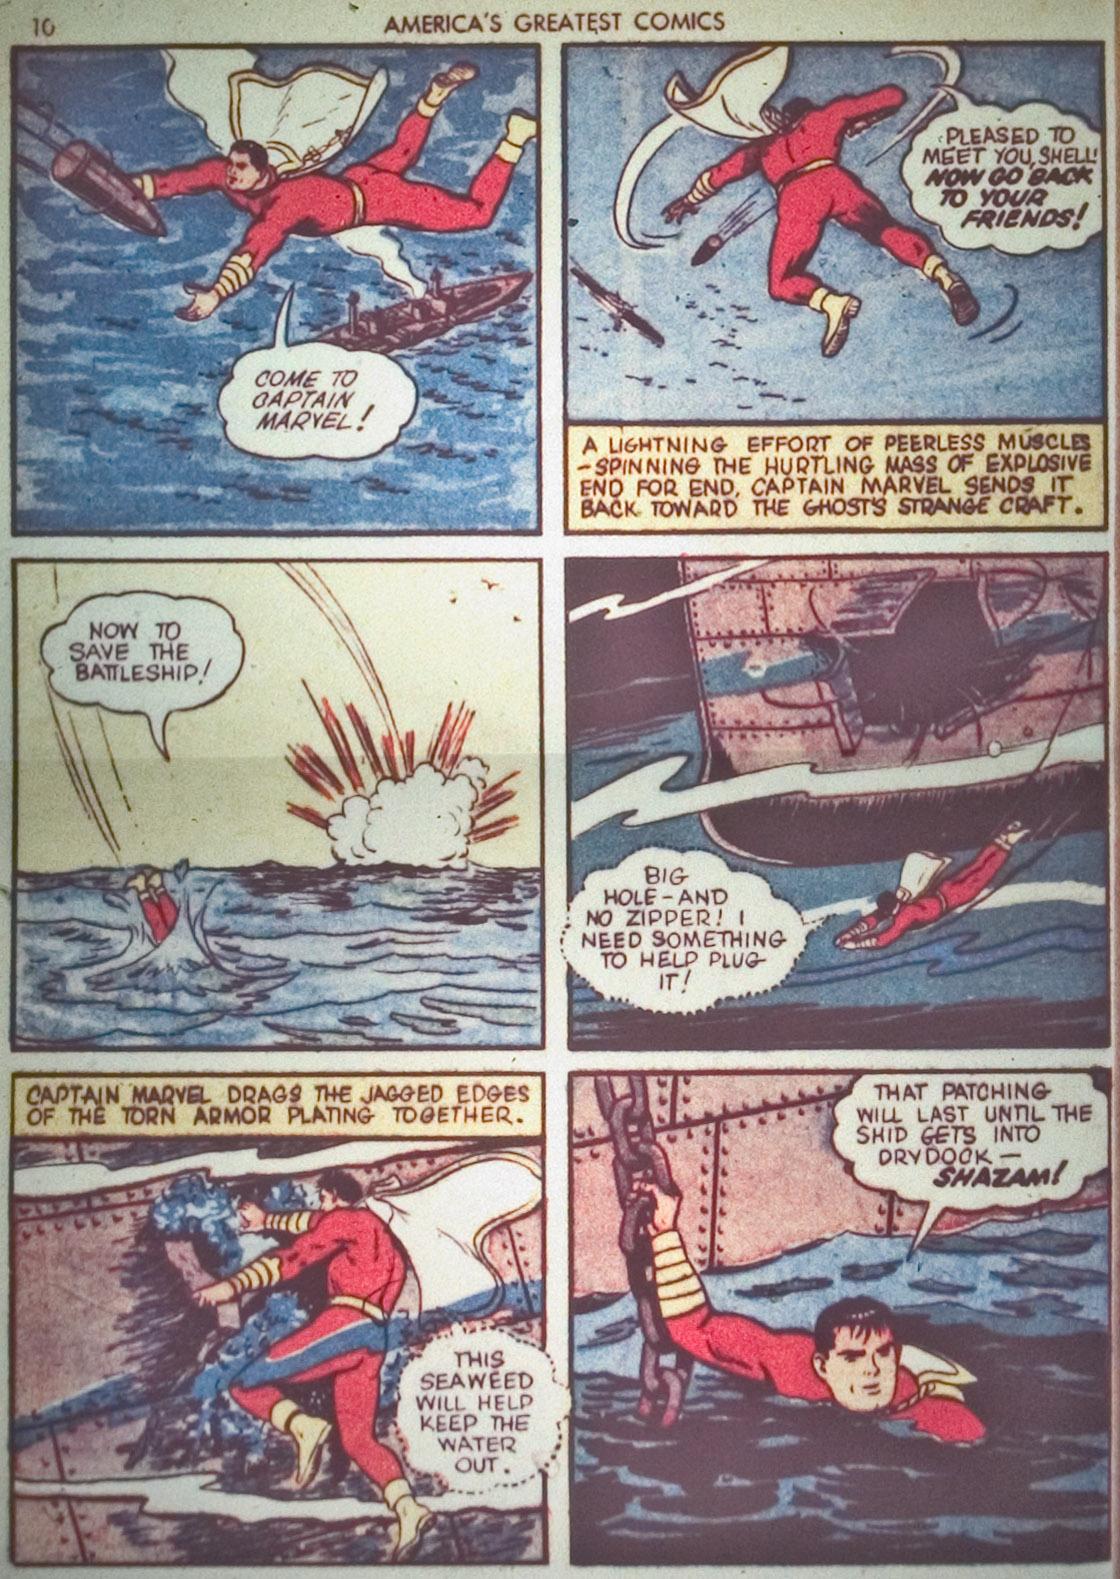 Read online America's Greatest Comics comic -  Issue #1 - 13